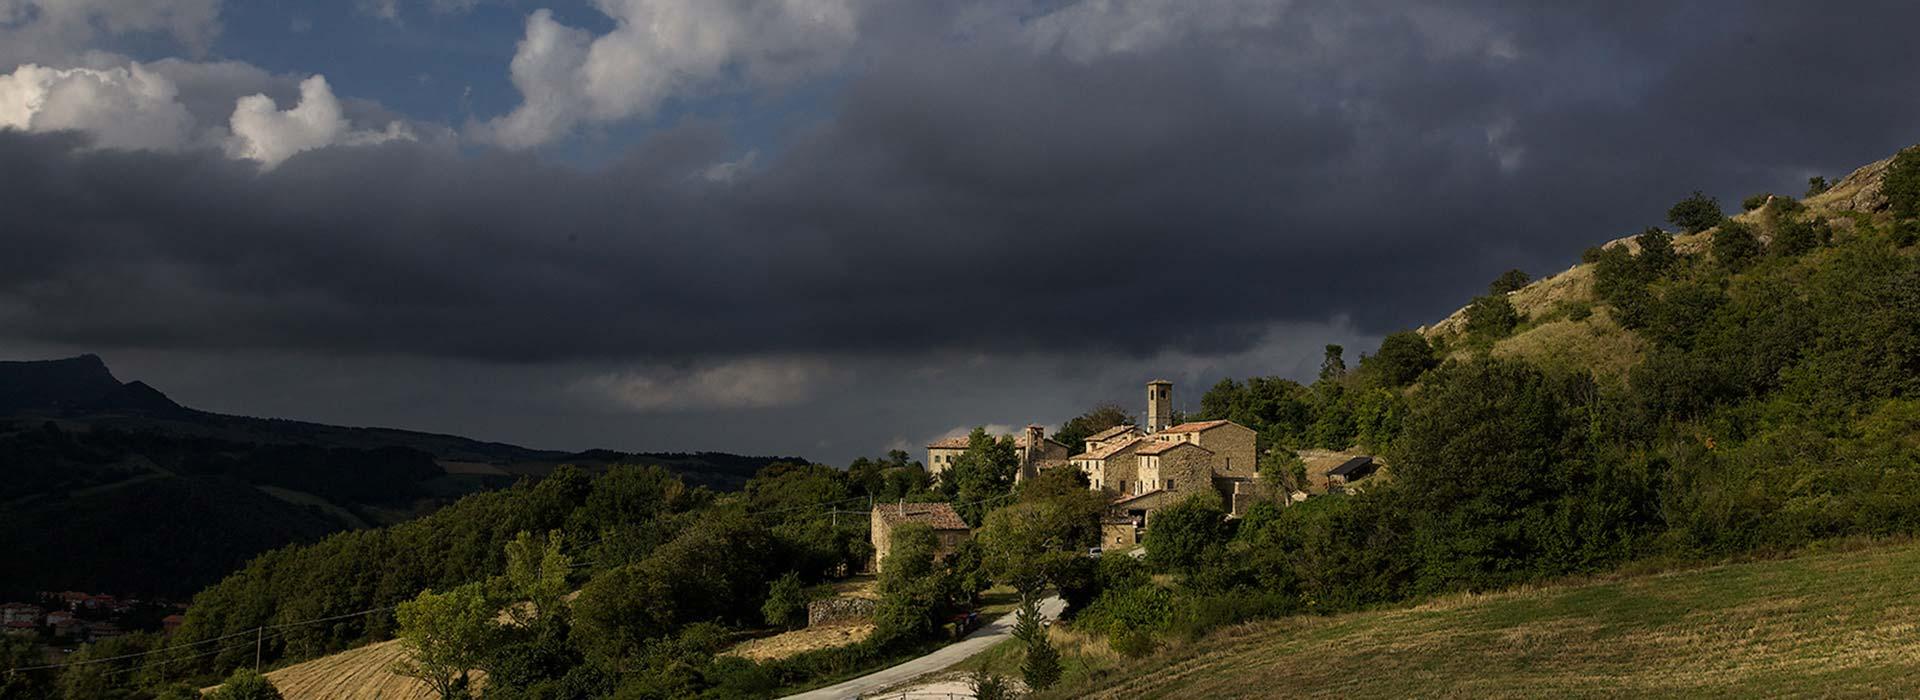 montefeltro-pietrarubbia